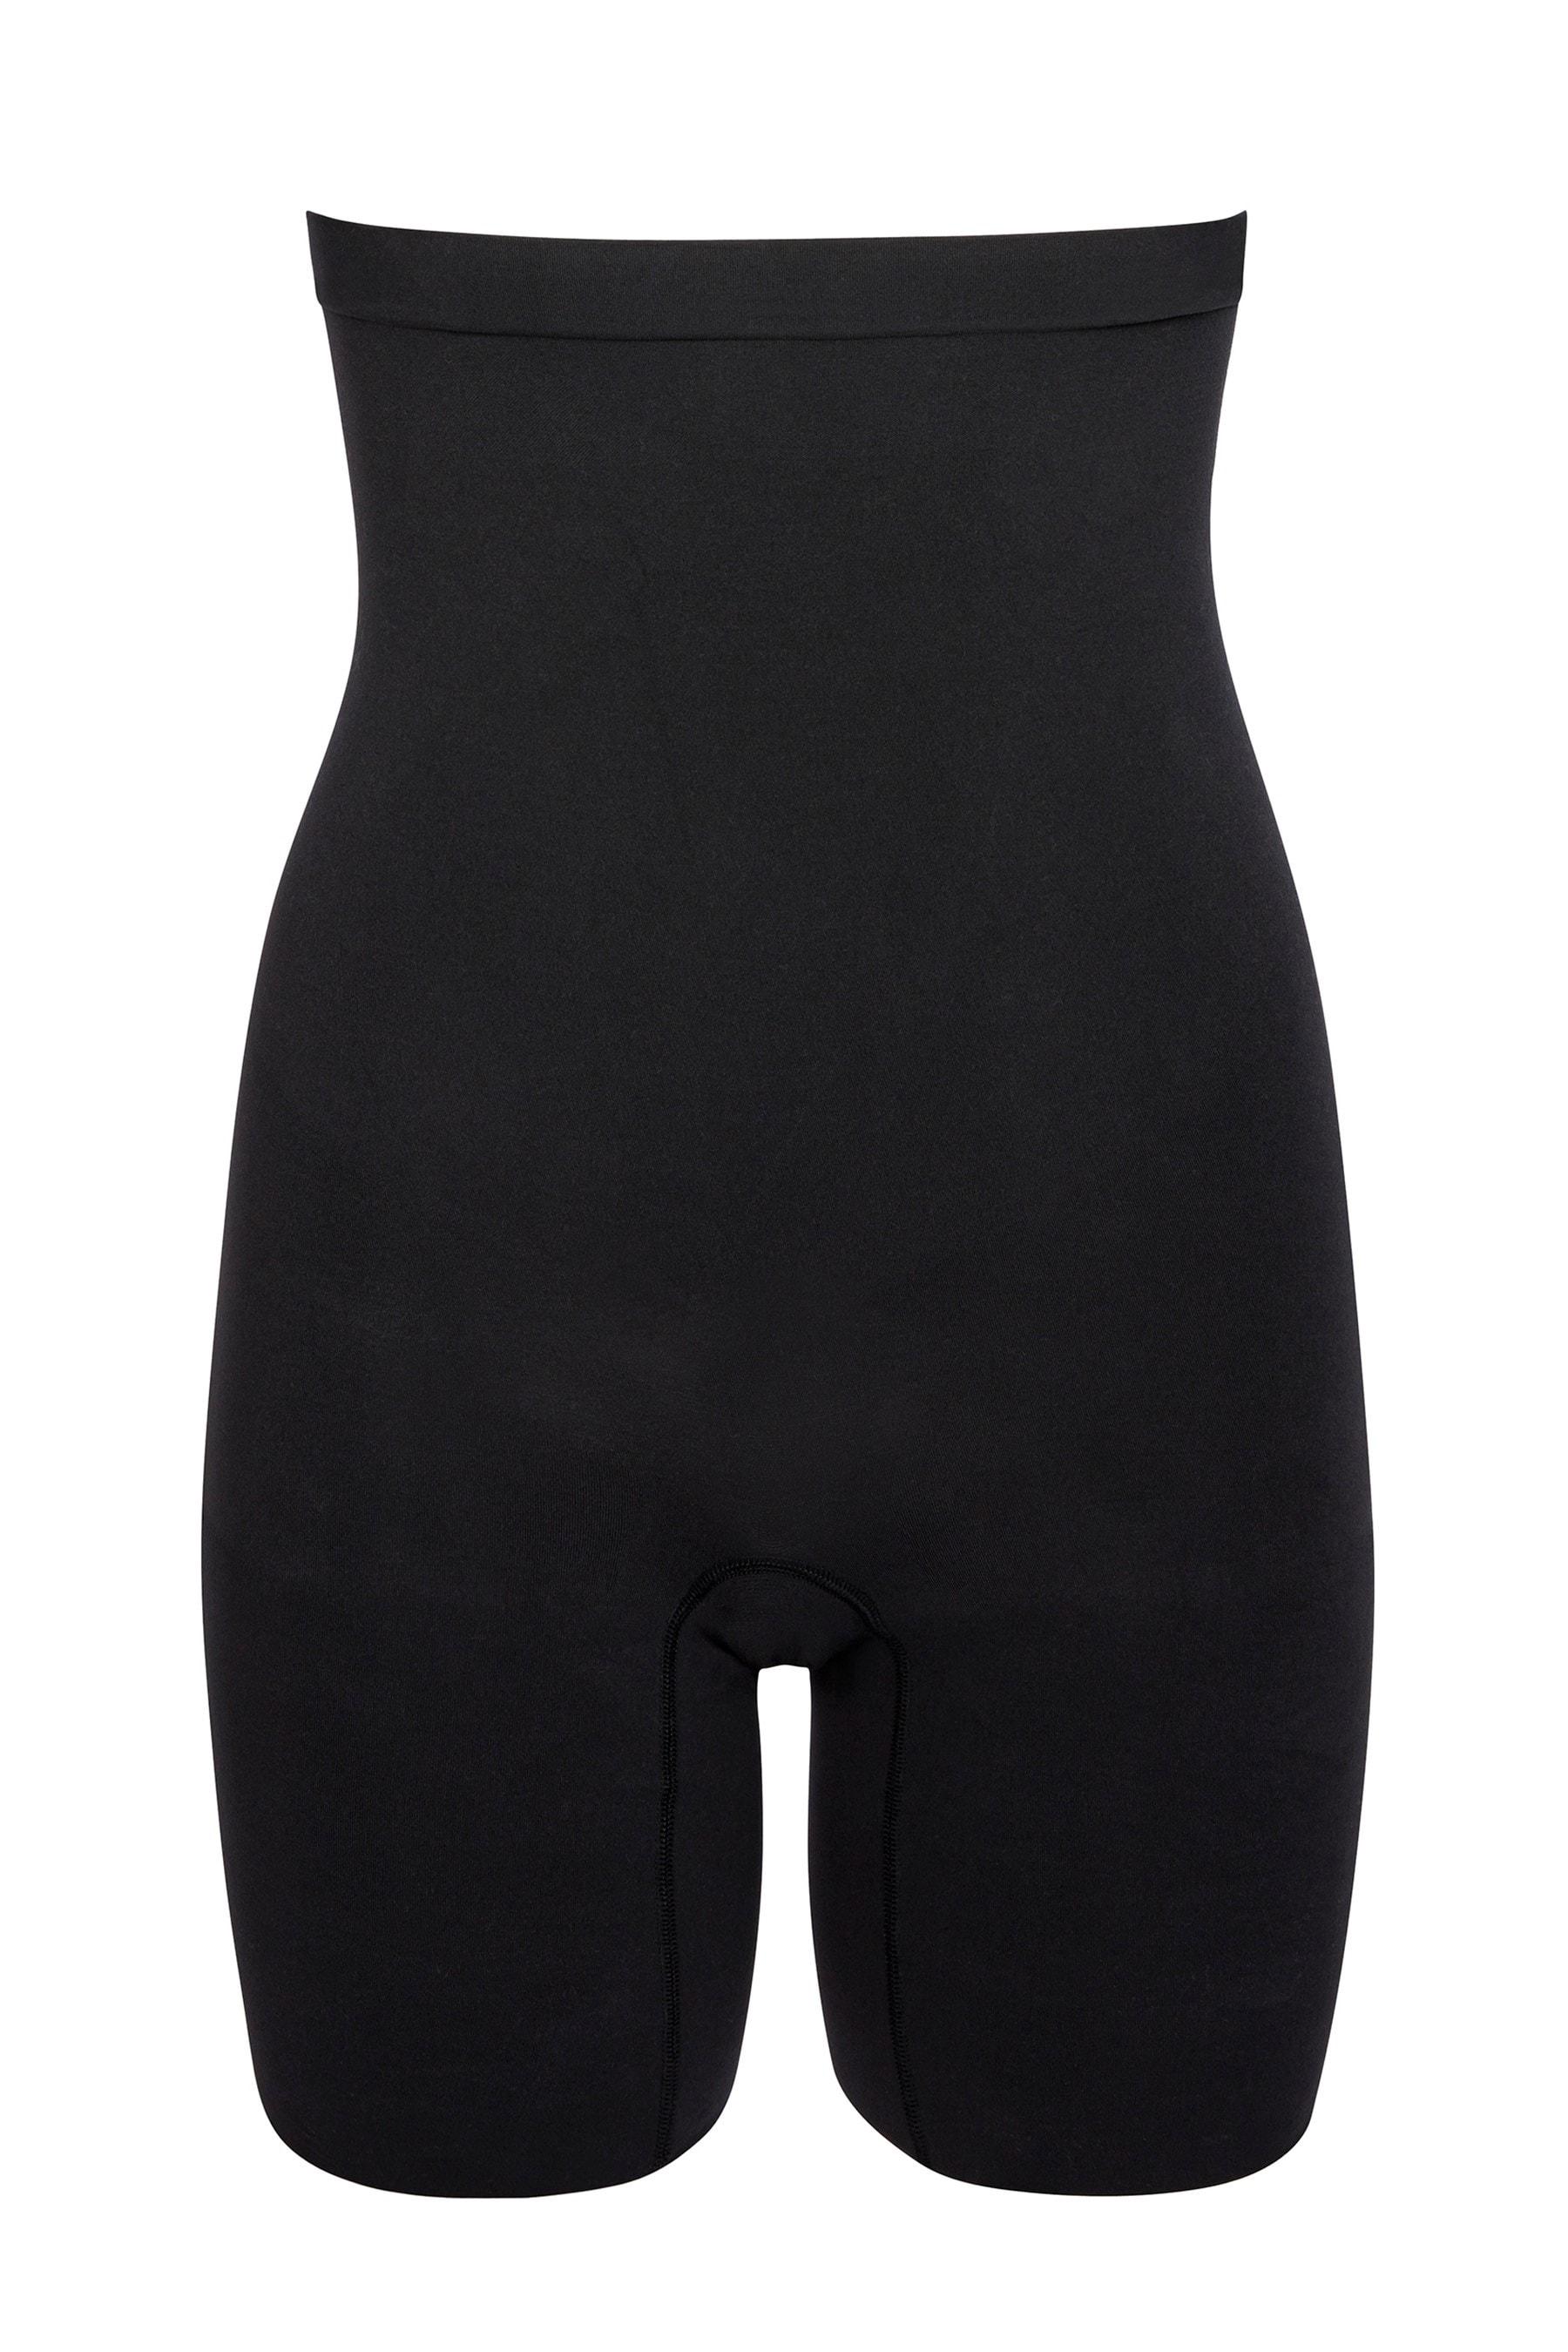 Spanx 241608 Womens High-Waisted Power Shorts Tummy